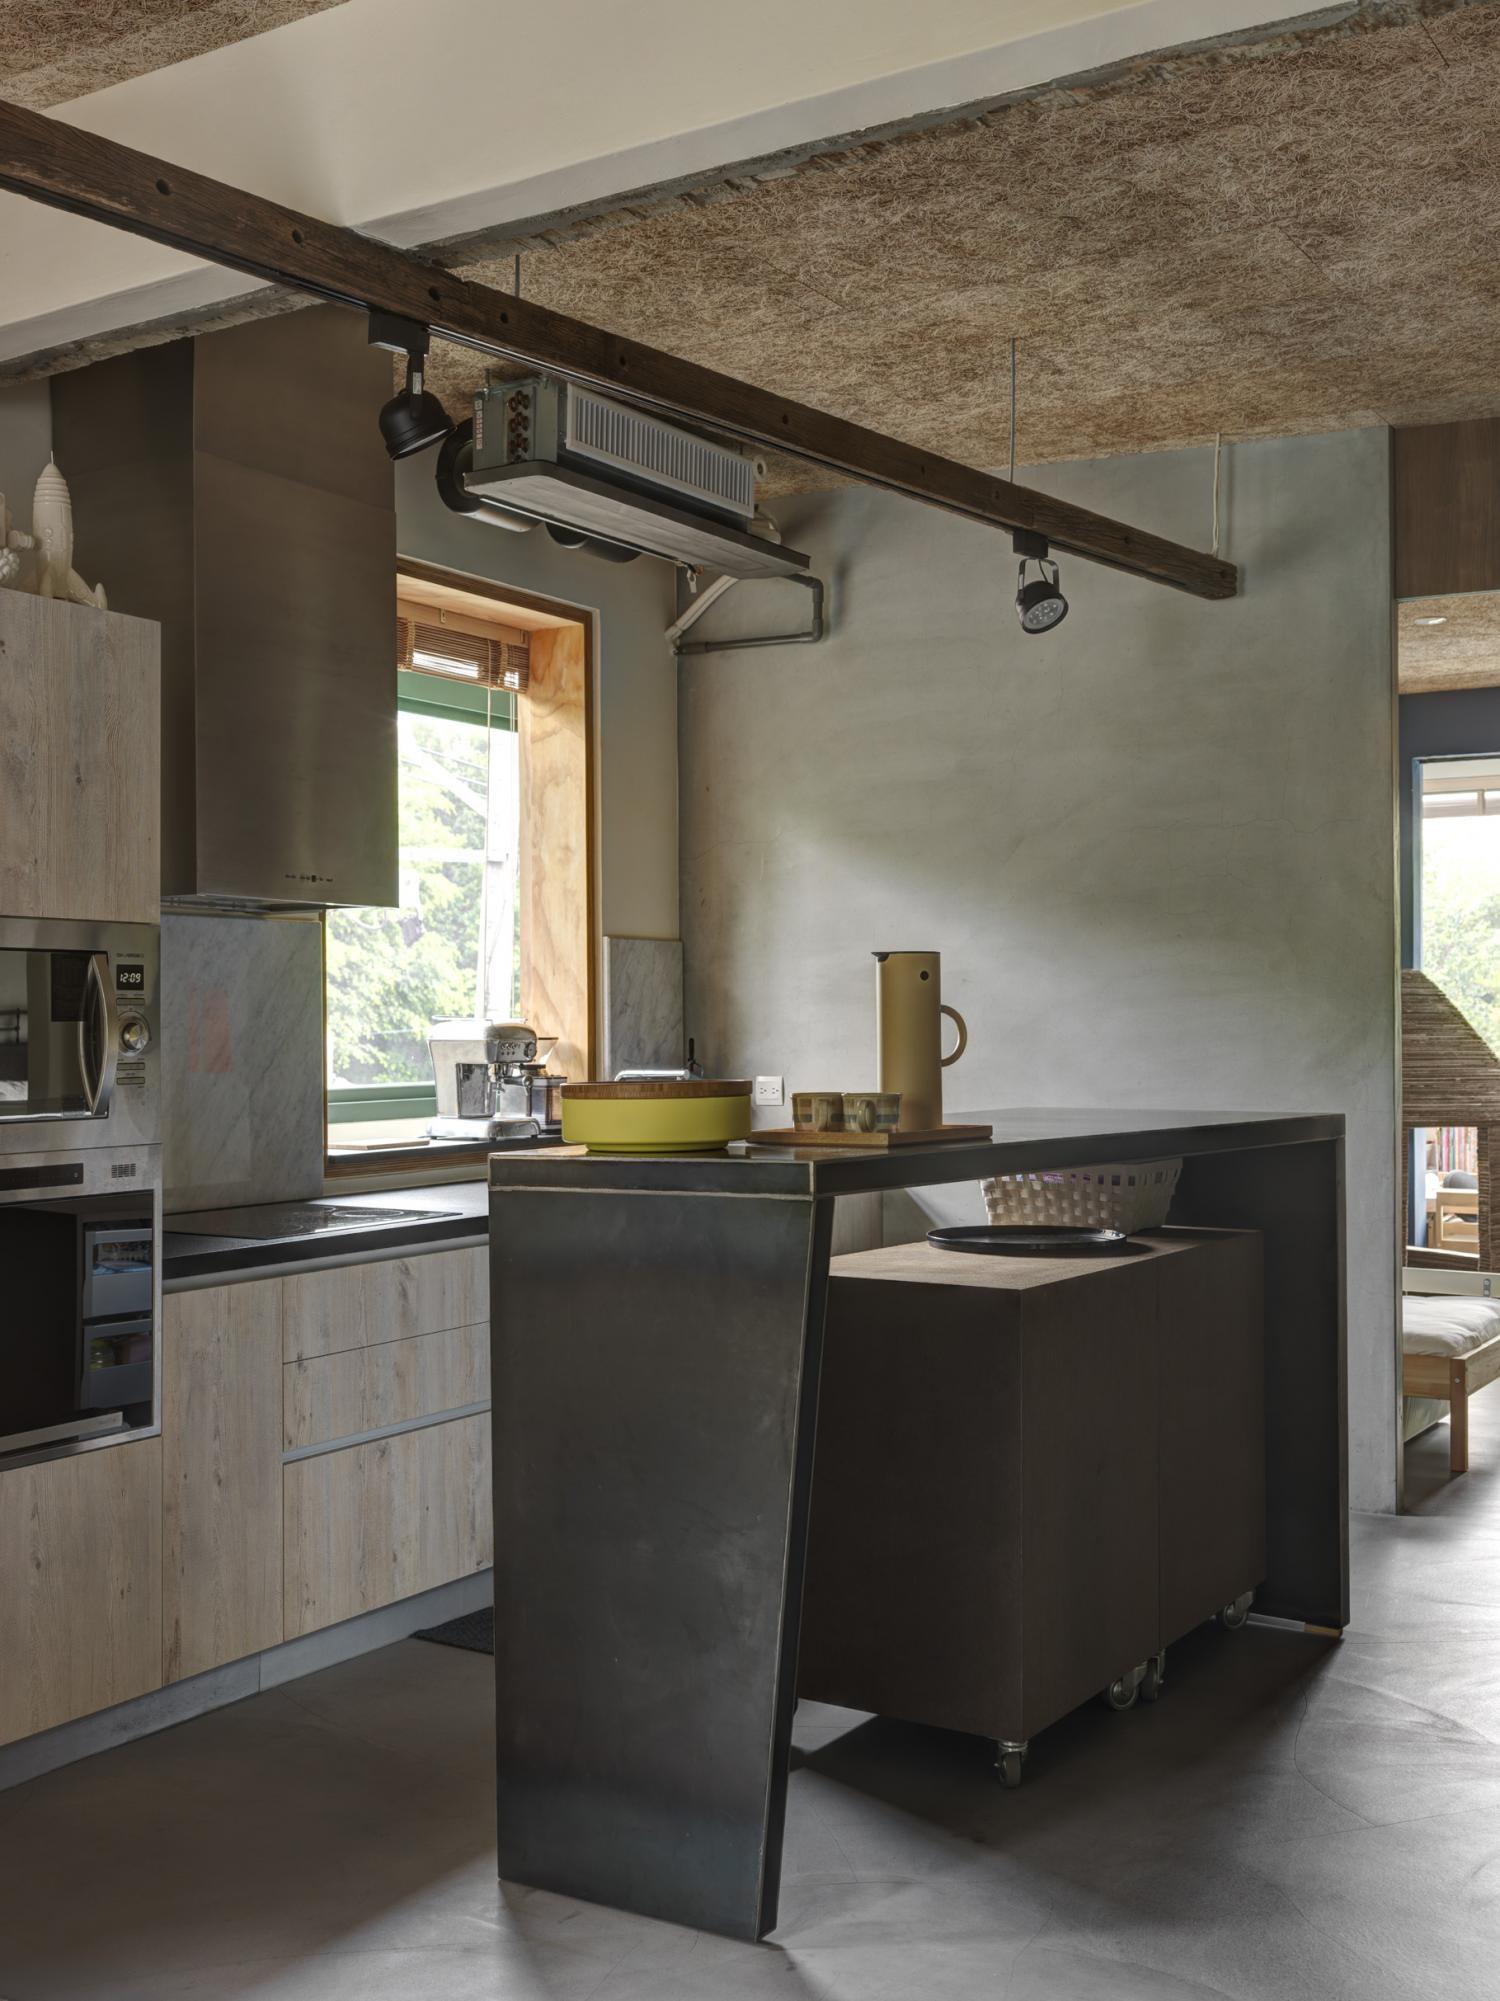 Interior Image 322